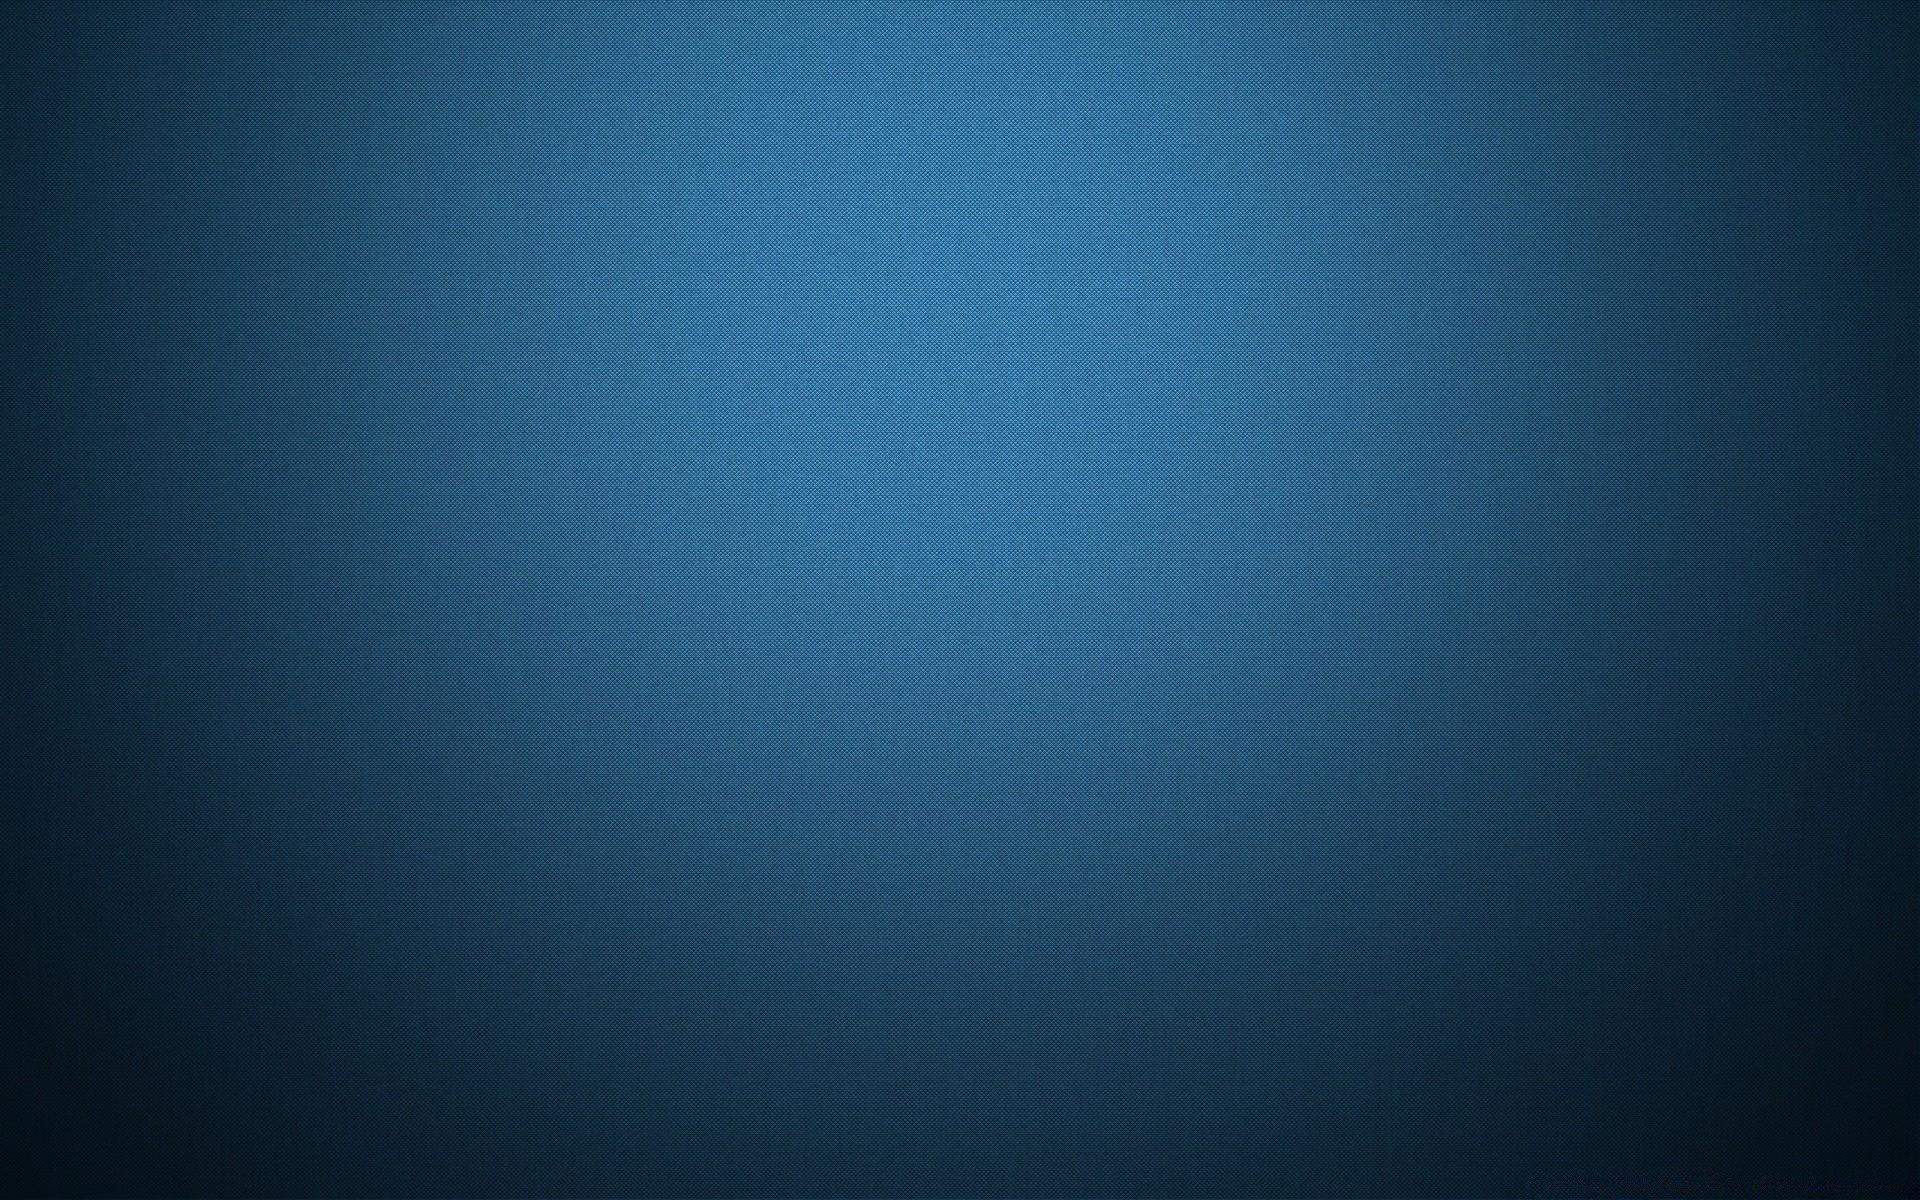 Dark Blue Background Phone Wallpapers